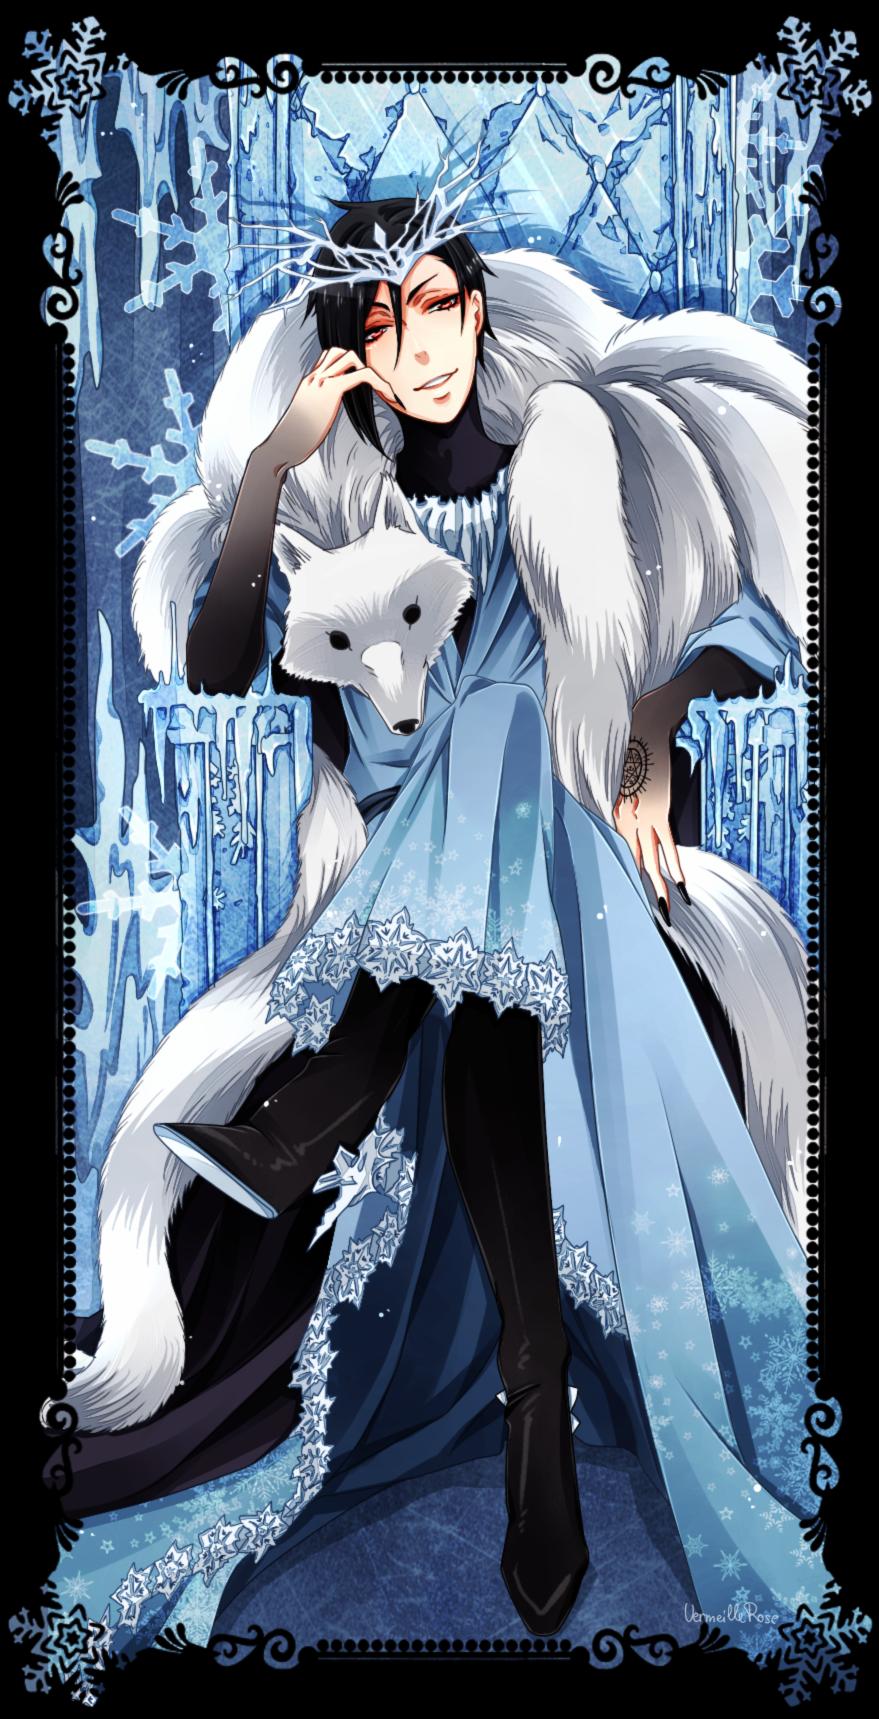 The Snow King by VermeilleRose Черный дворецкий аниме